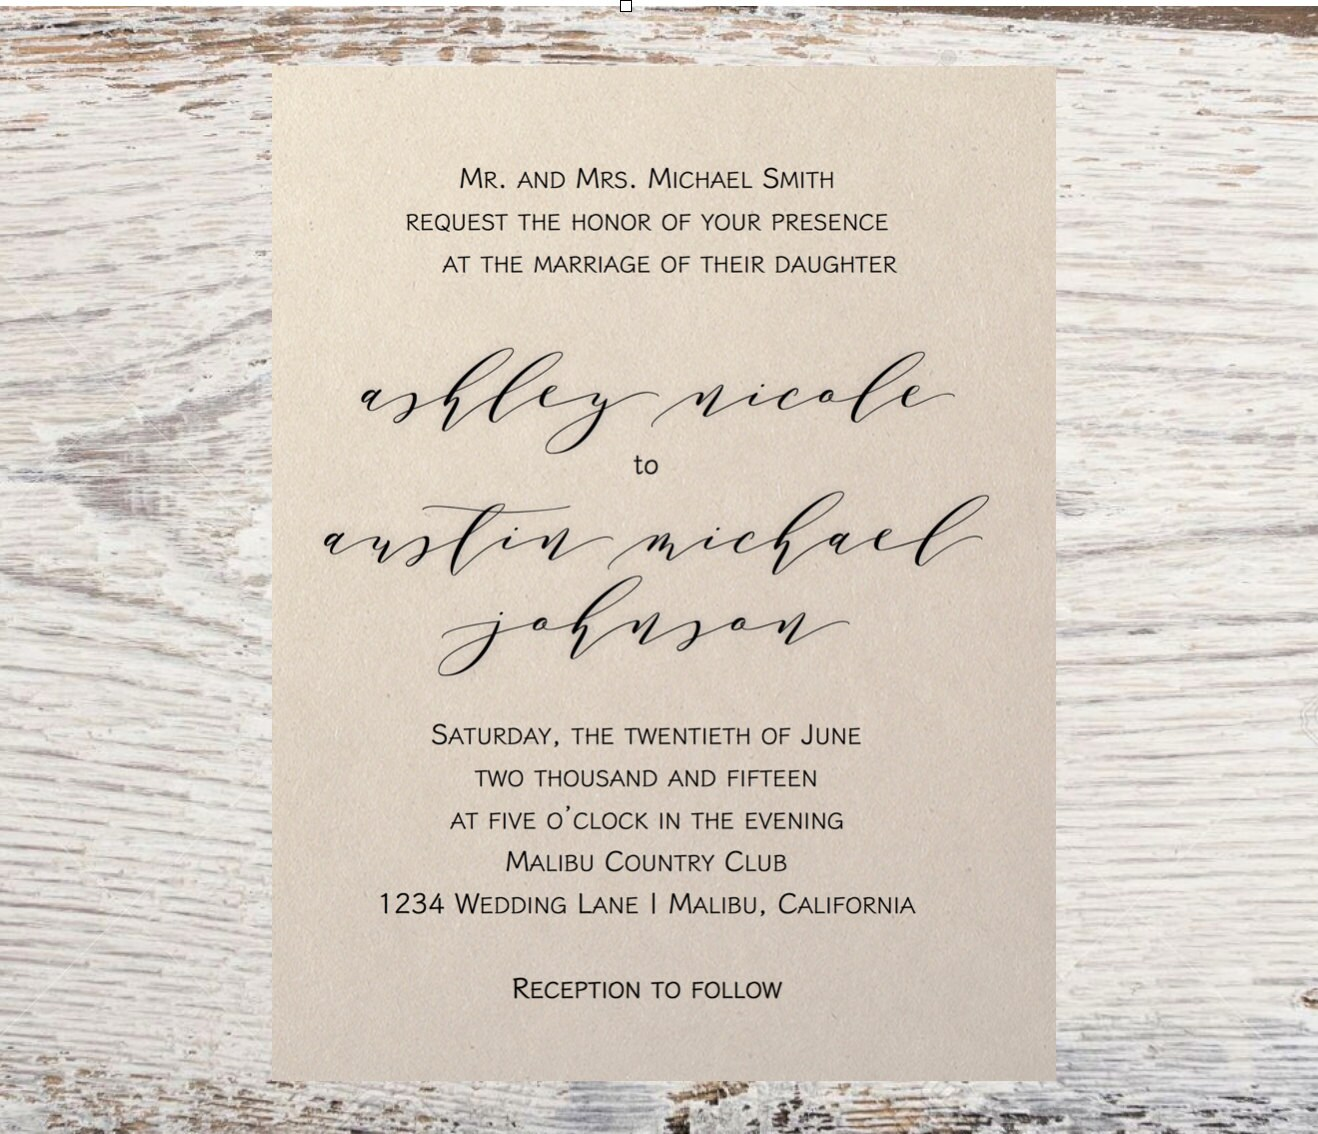 Wedding Invitation - Simple Wedding Invitation - Simple & Timeless ...